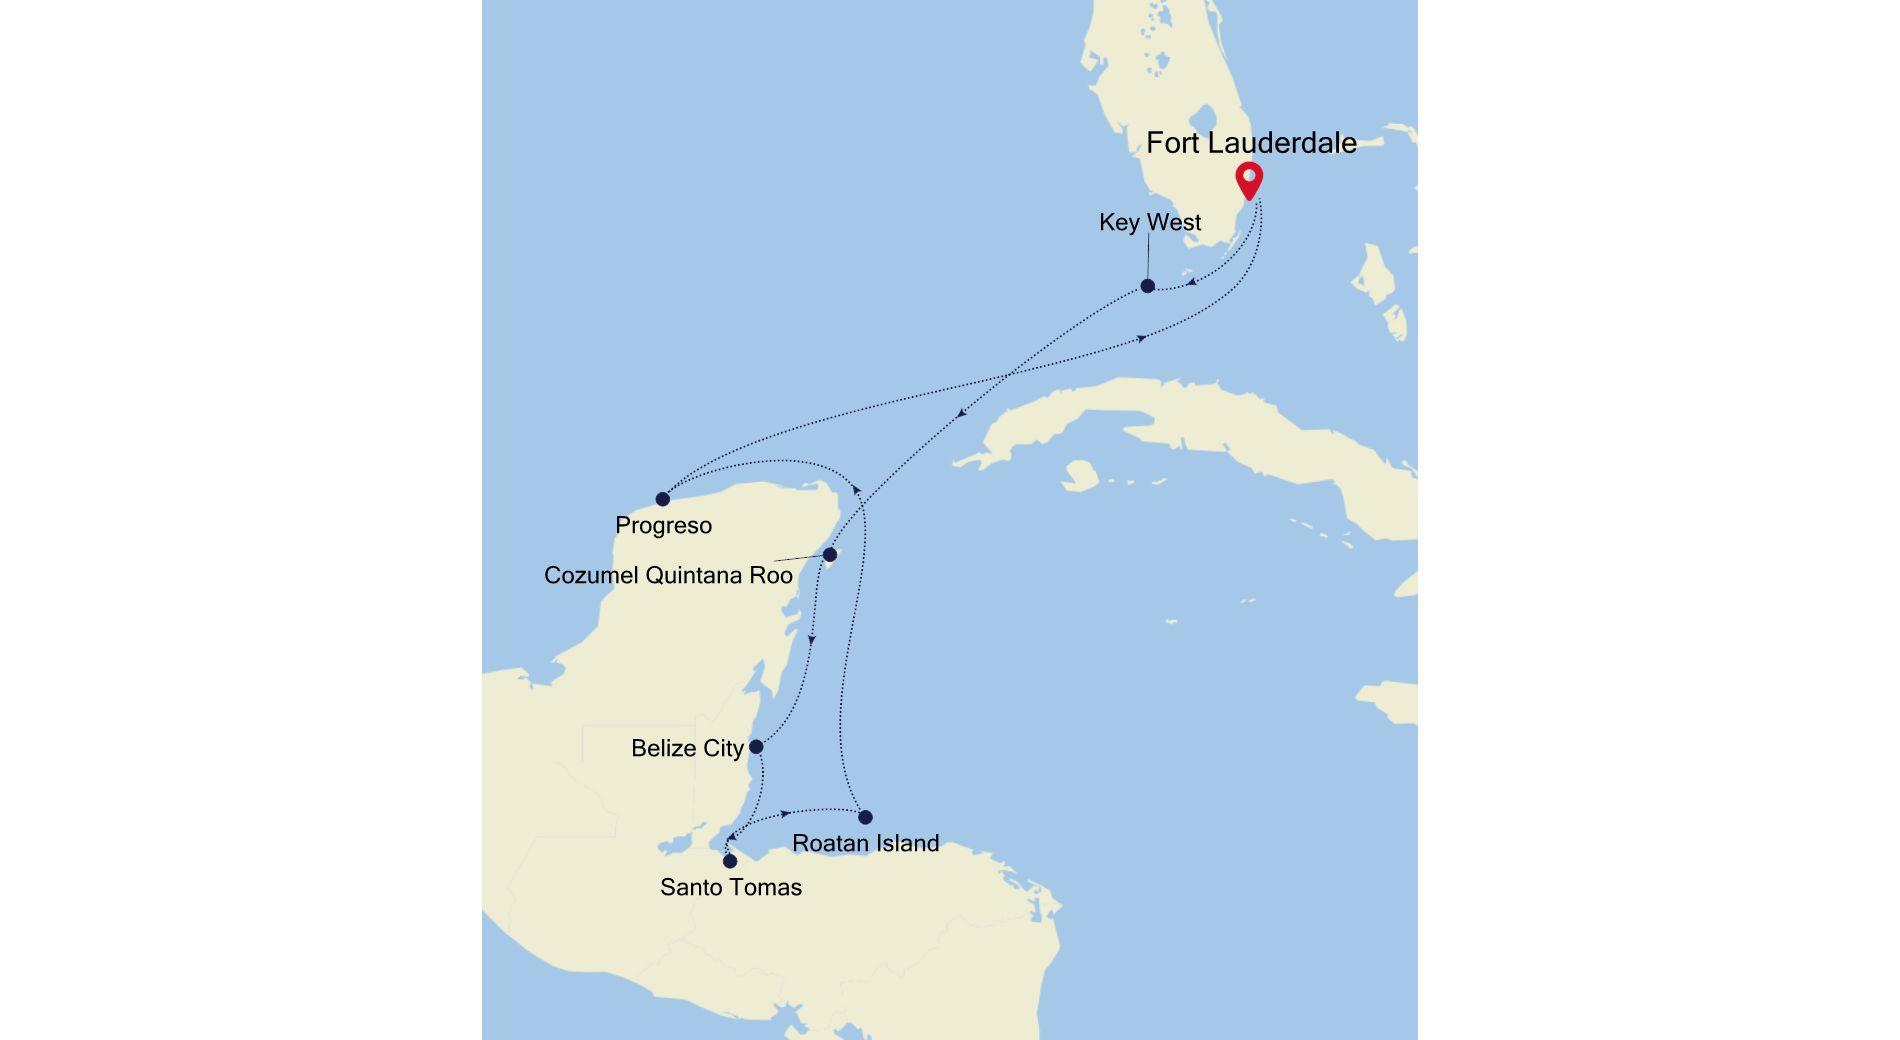 SL220103011 - Fort Lauderdale a Fort Lauderdale